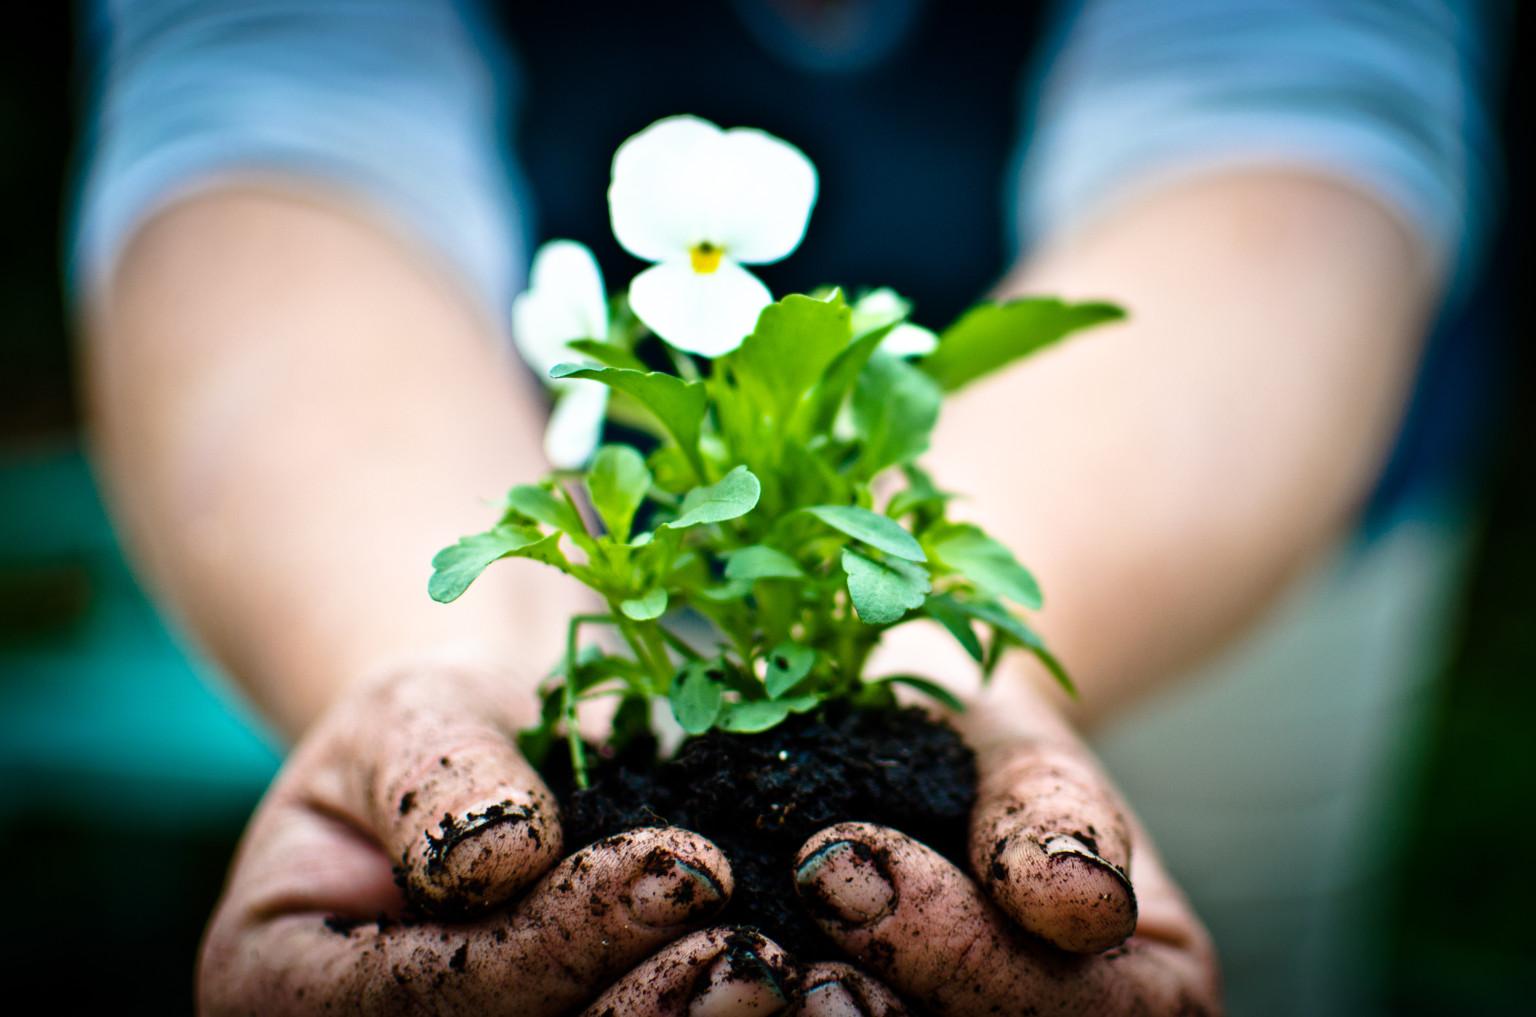 Edmonton gardening